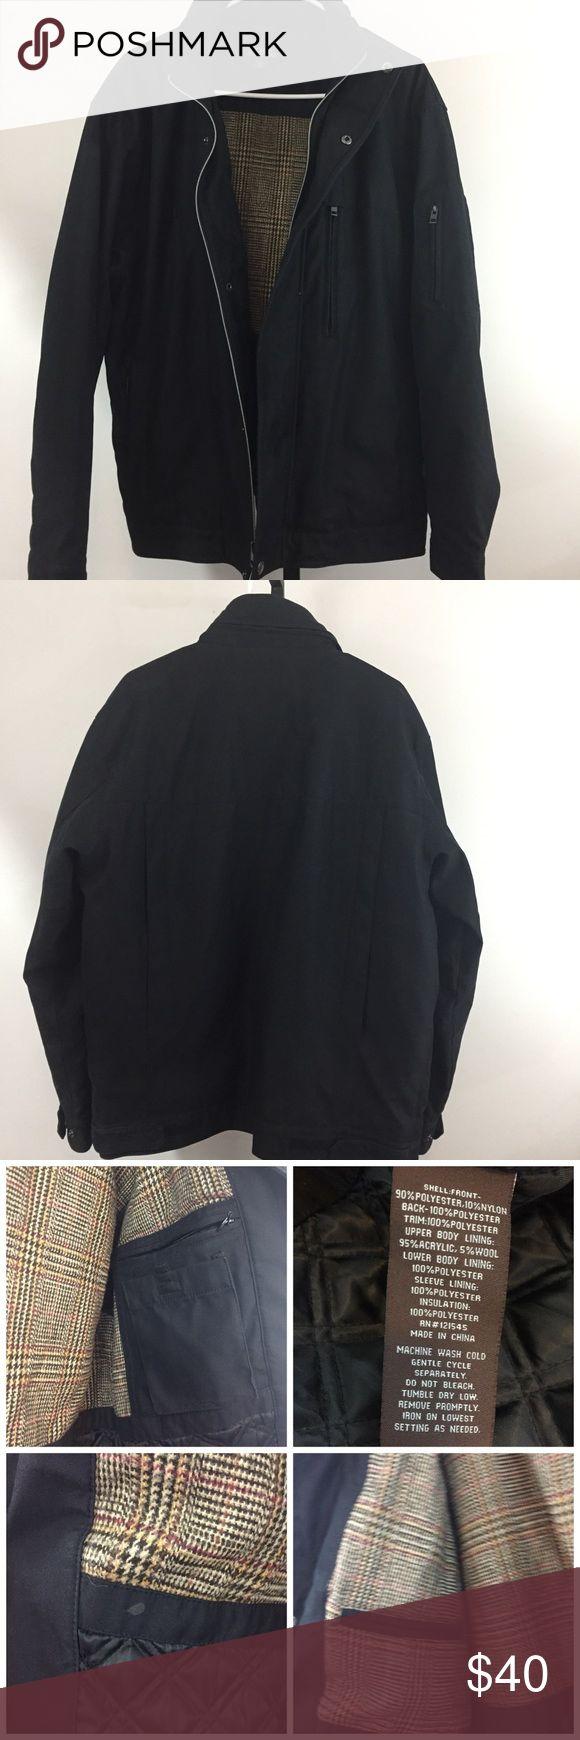 Michael Kors Men's Jacket Medium Good used condition  A few light spots. Pictured  Hood folds up into collar Size medium  Bin U Michael Kors Jackets & Coats